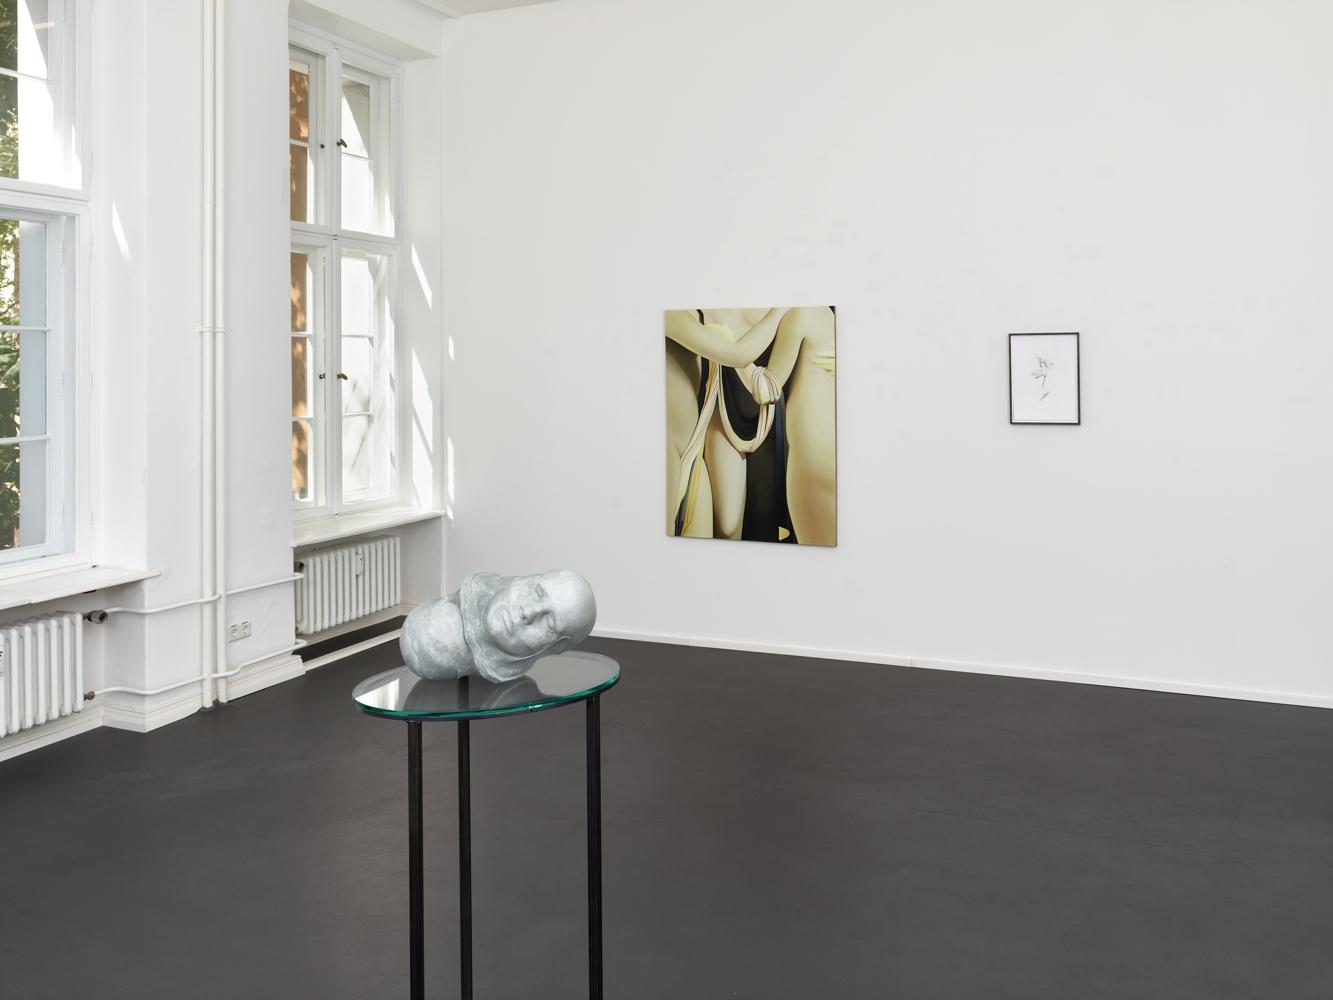 Vivian Greven, GRAZIA, Installationsansicht, Aurel Scheibler, 2017. Vivian Greven, Courtesy Aurel Scheibler, Berlin. Foto: Eric Tschernow